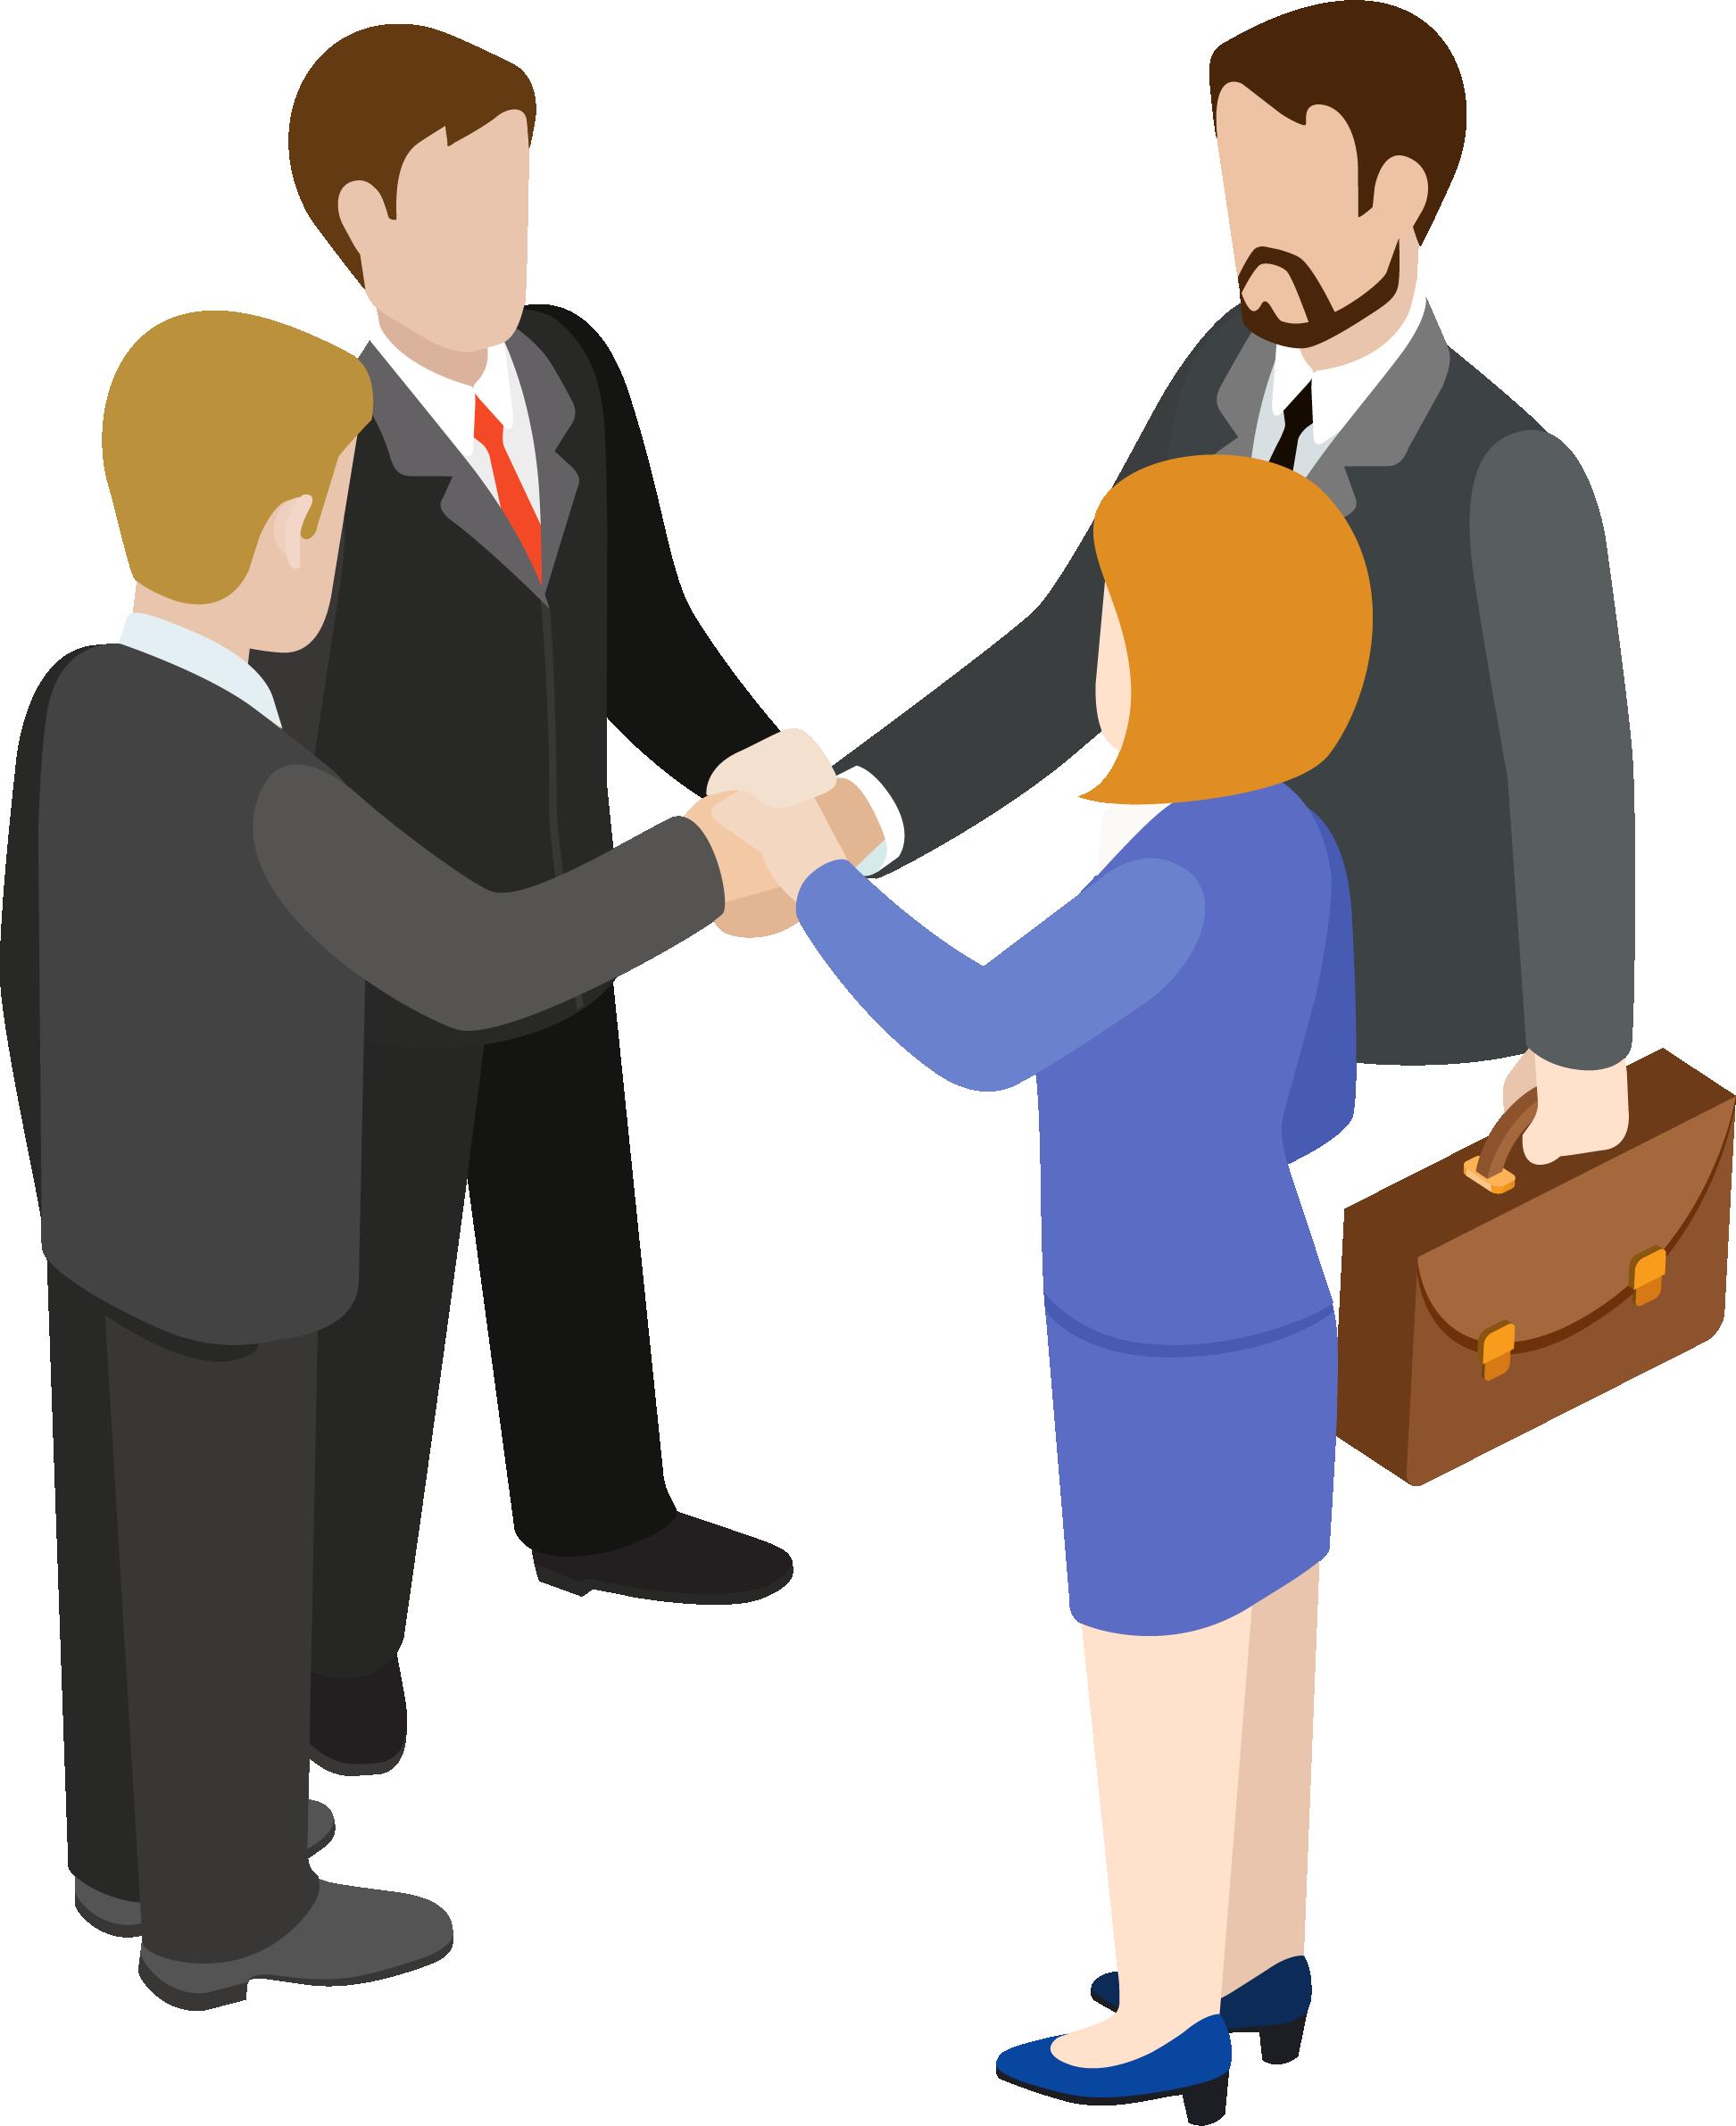 Working clipart career. Jobs enprode name surname